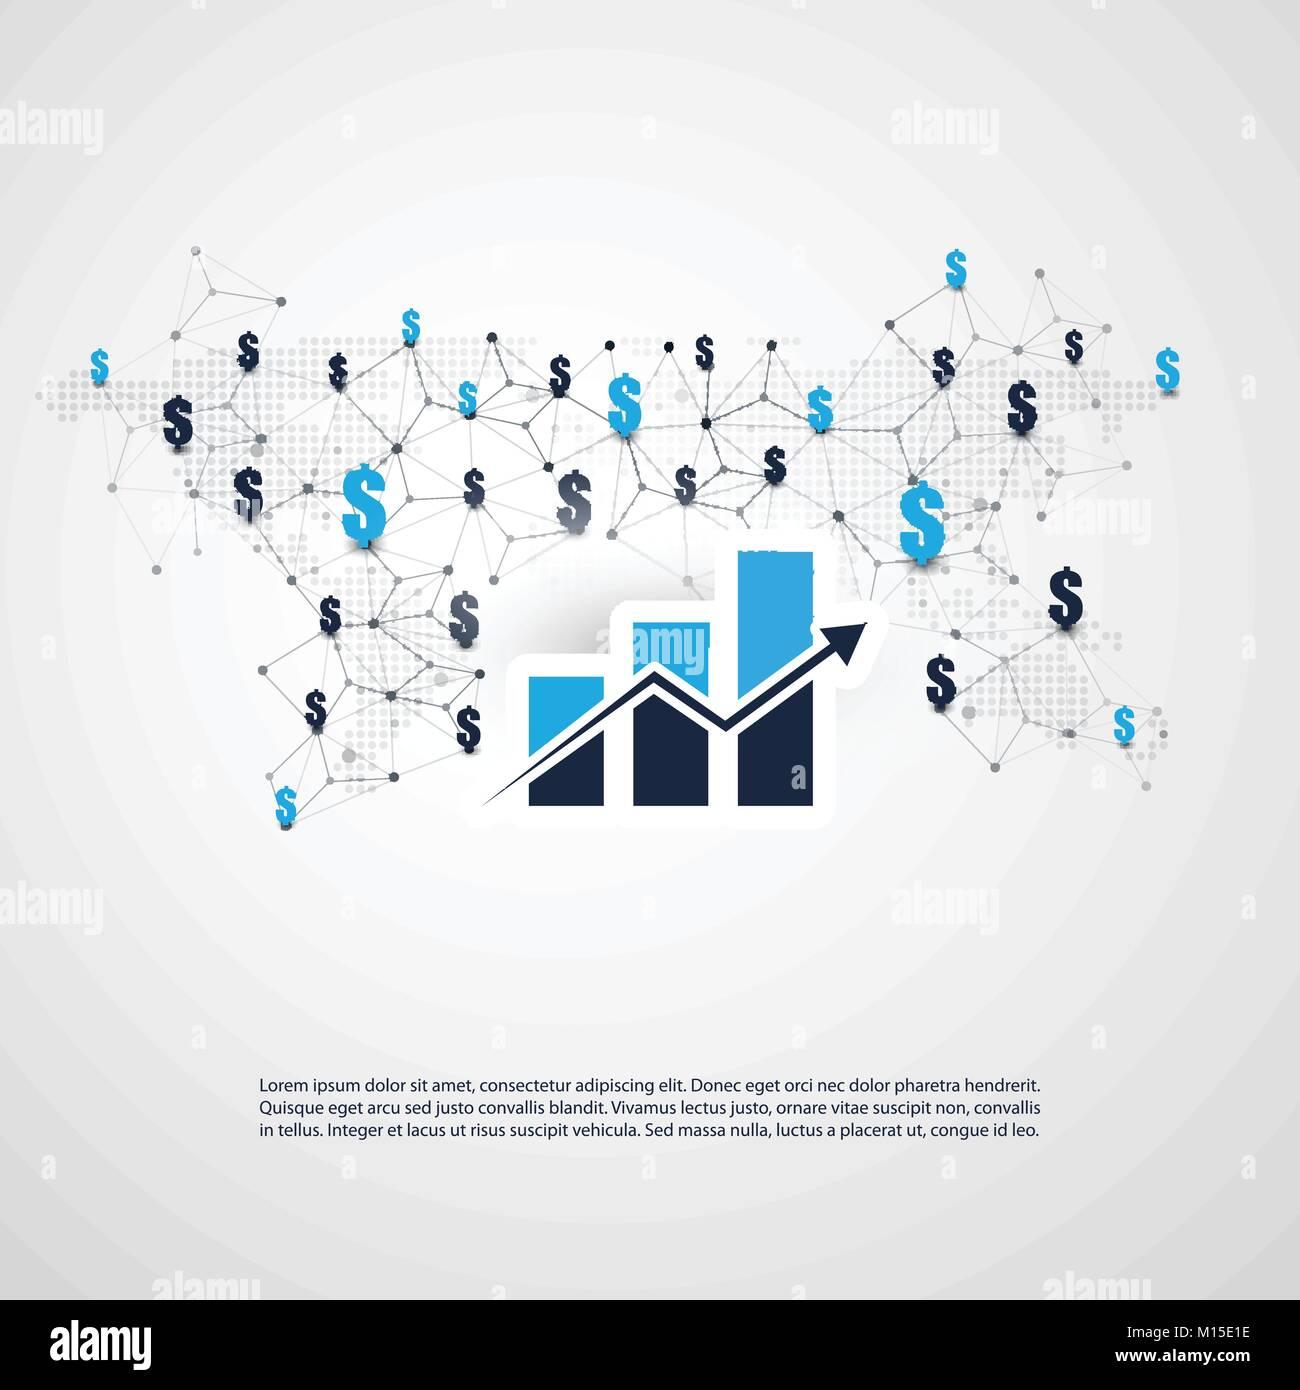 Netzwerke Geschäftsverbindungen Weltweit Finanzielle